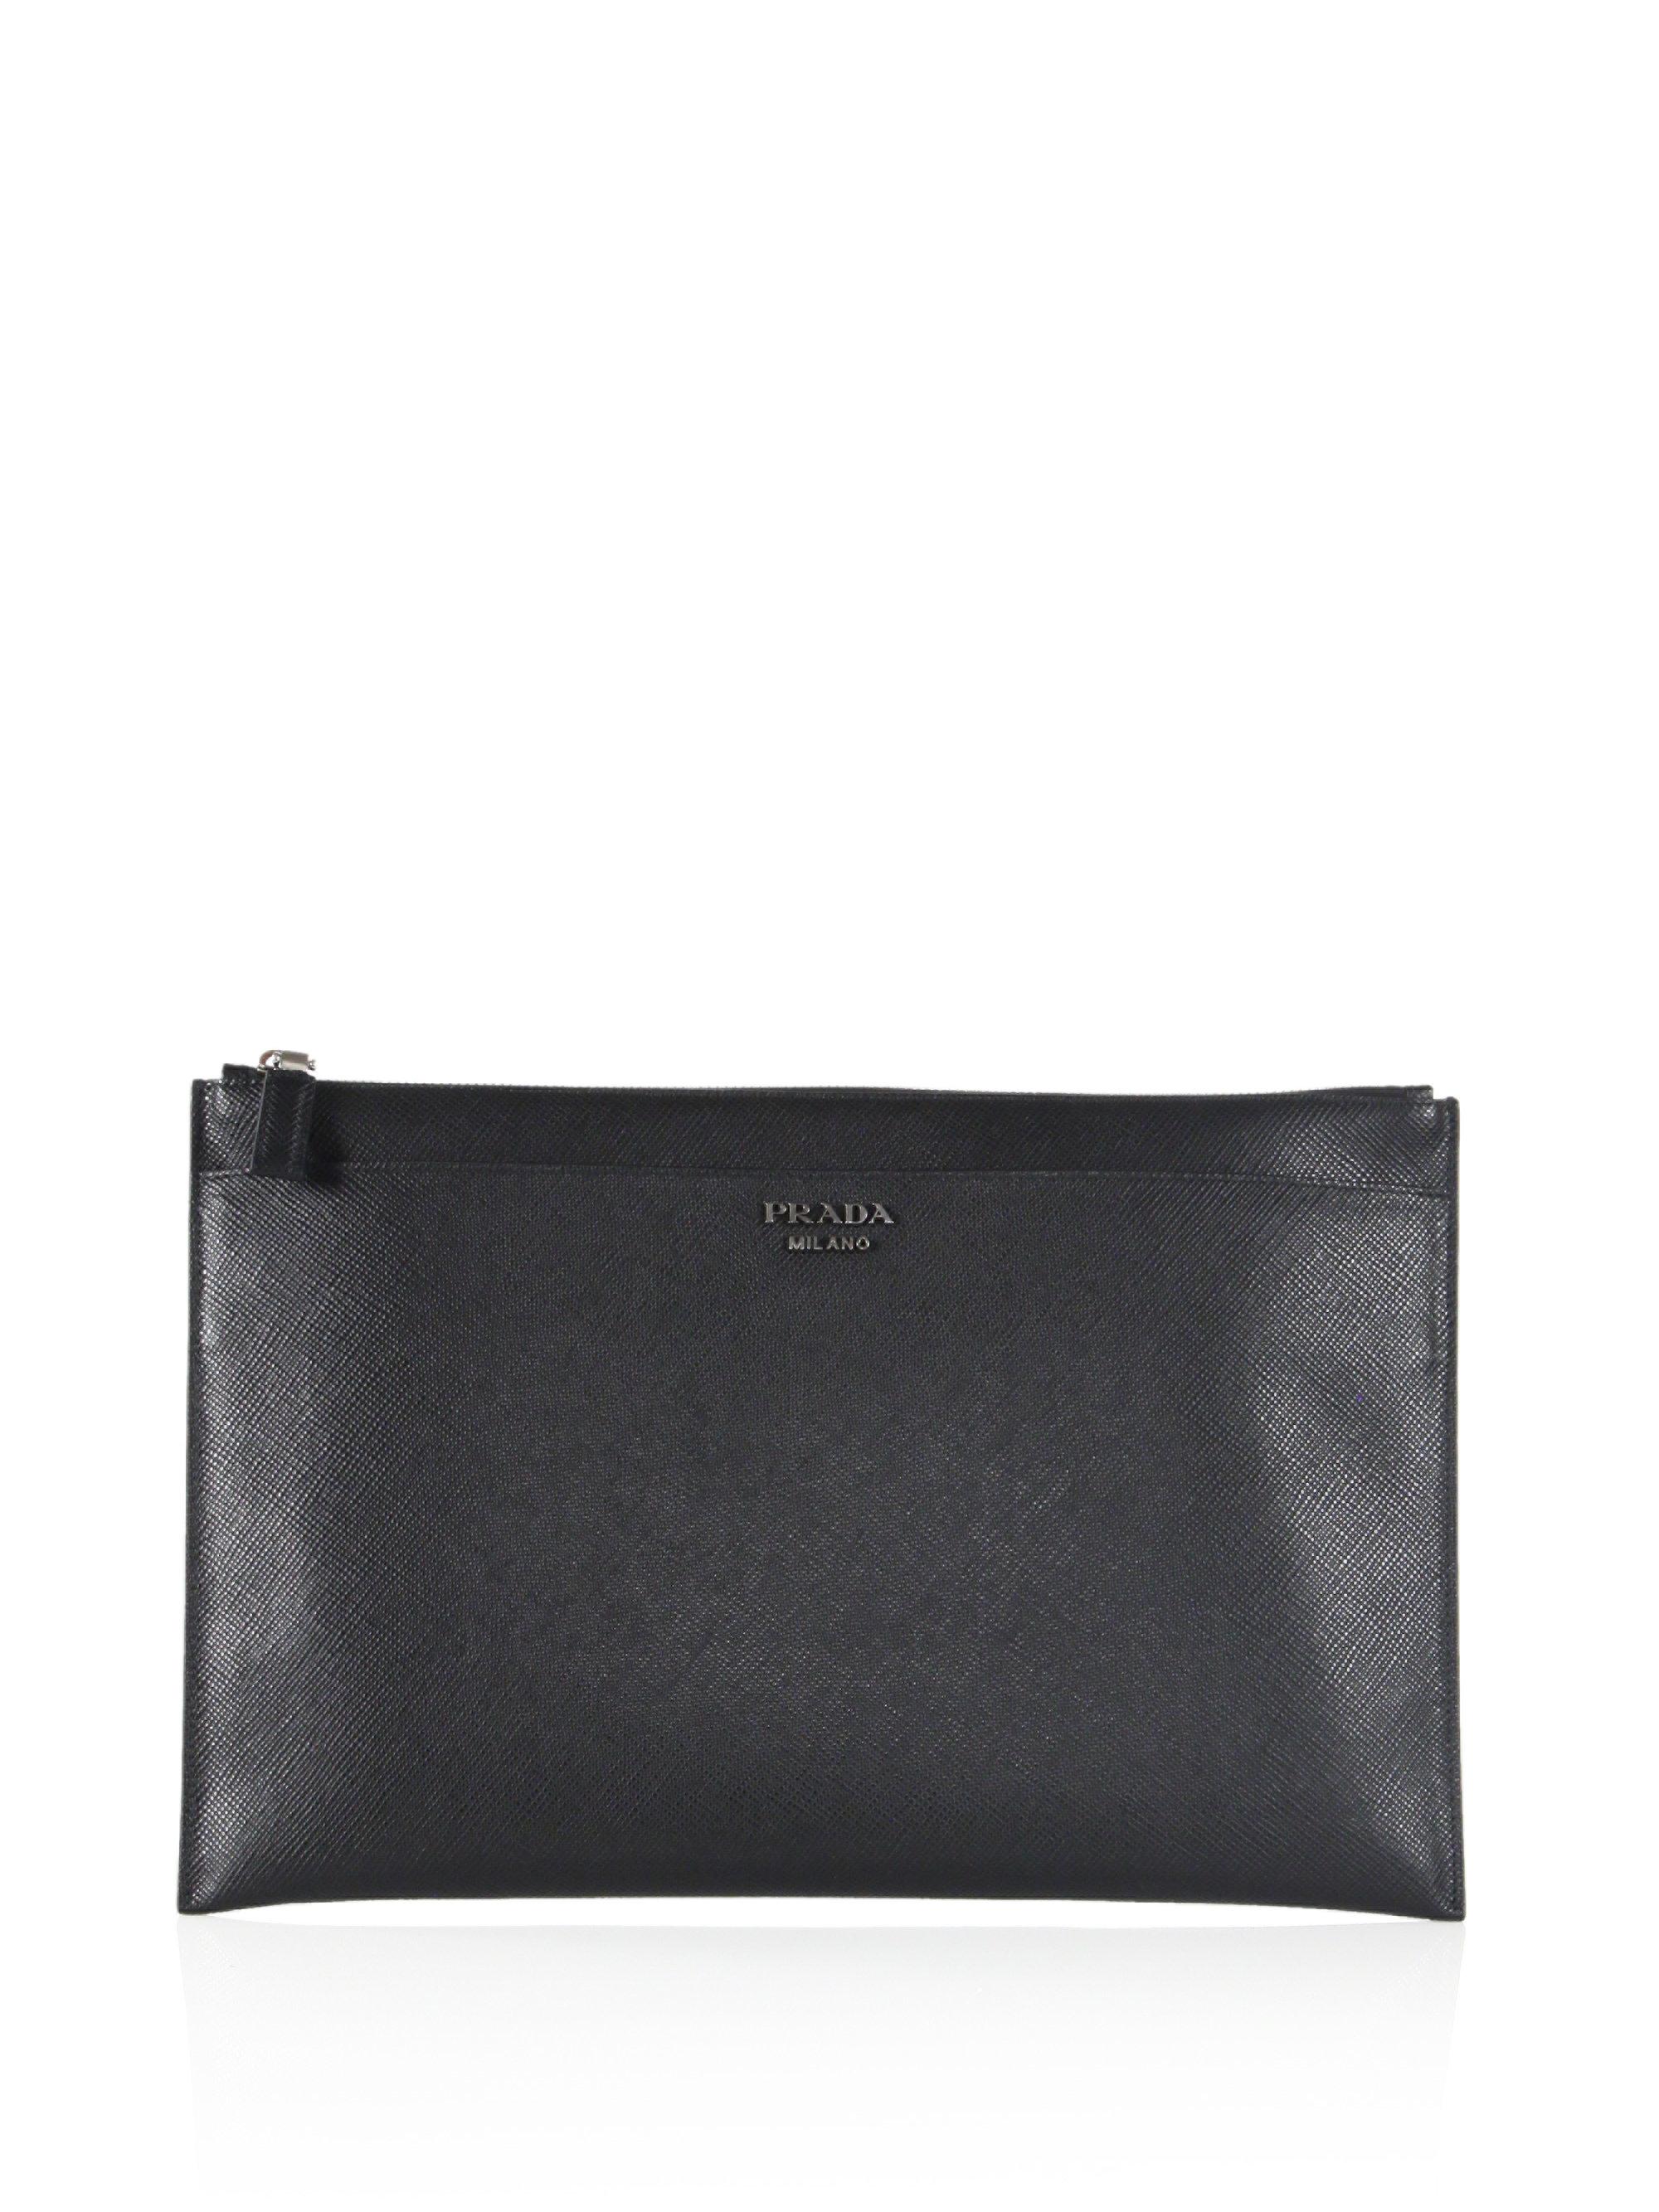 Prada embossed leather document holder in black for men lyst for Prada mens document holder